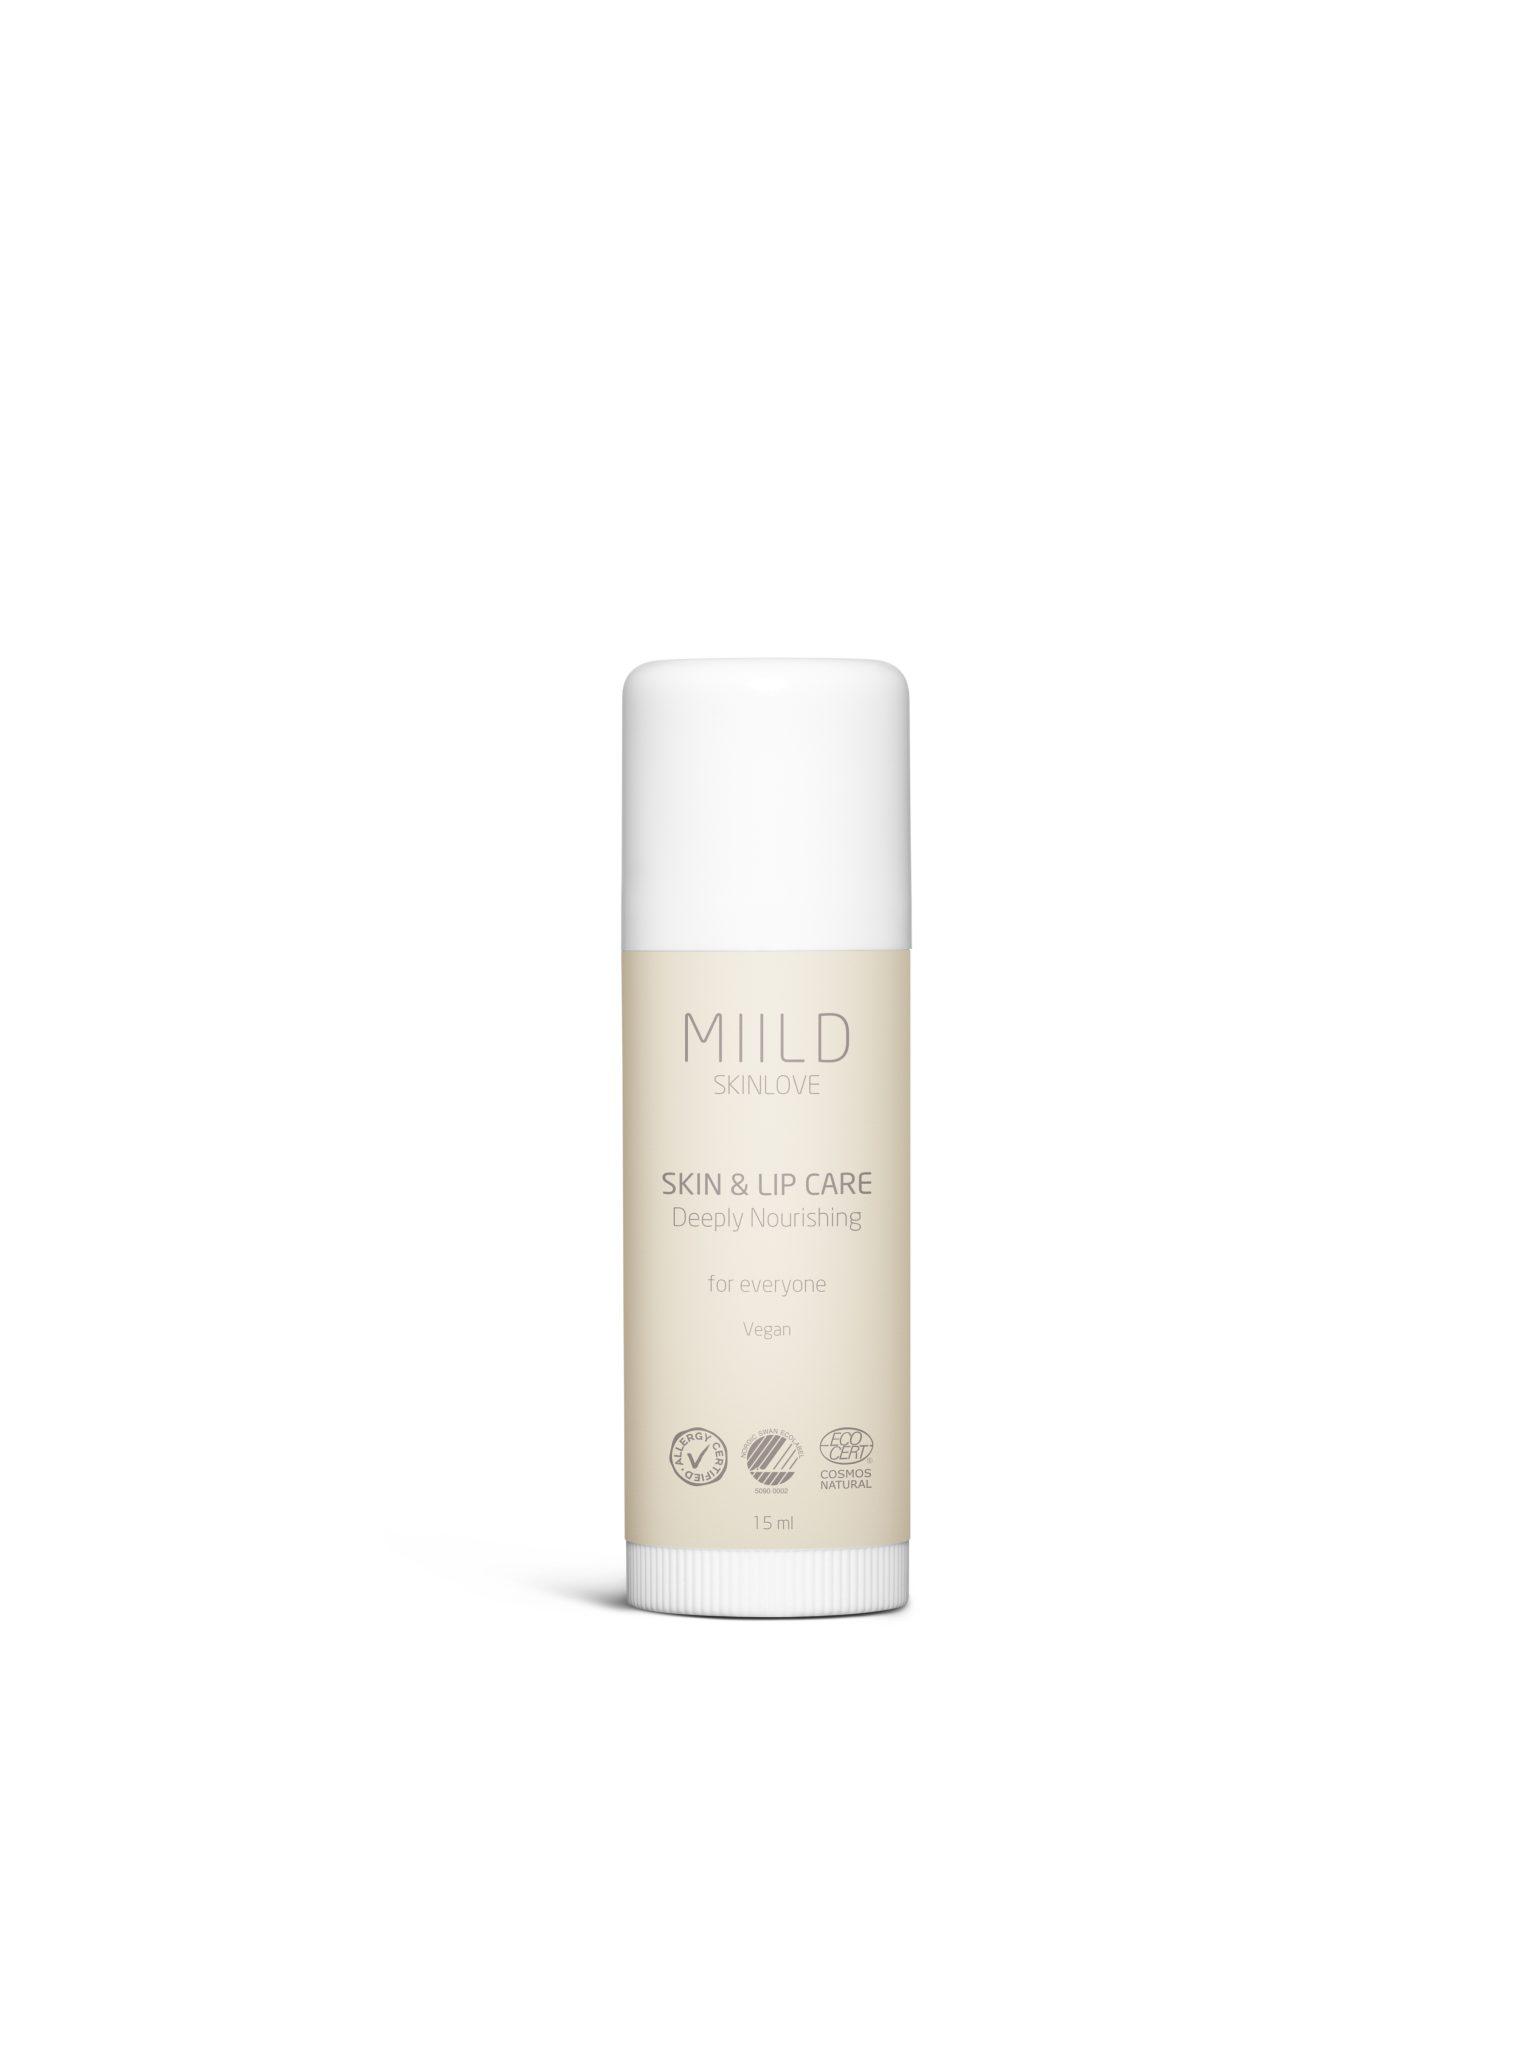 Miild Skin & Lip Care